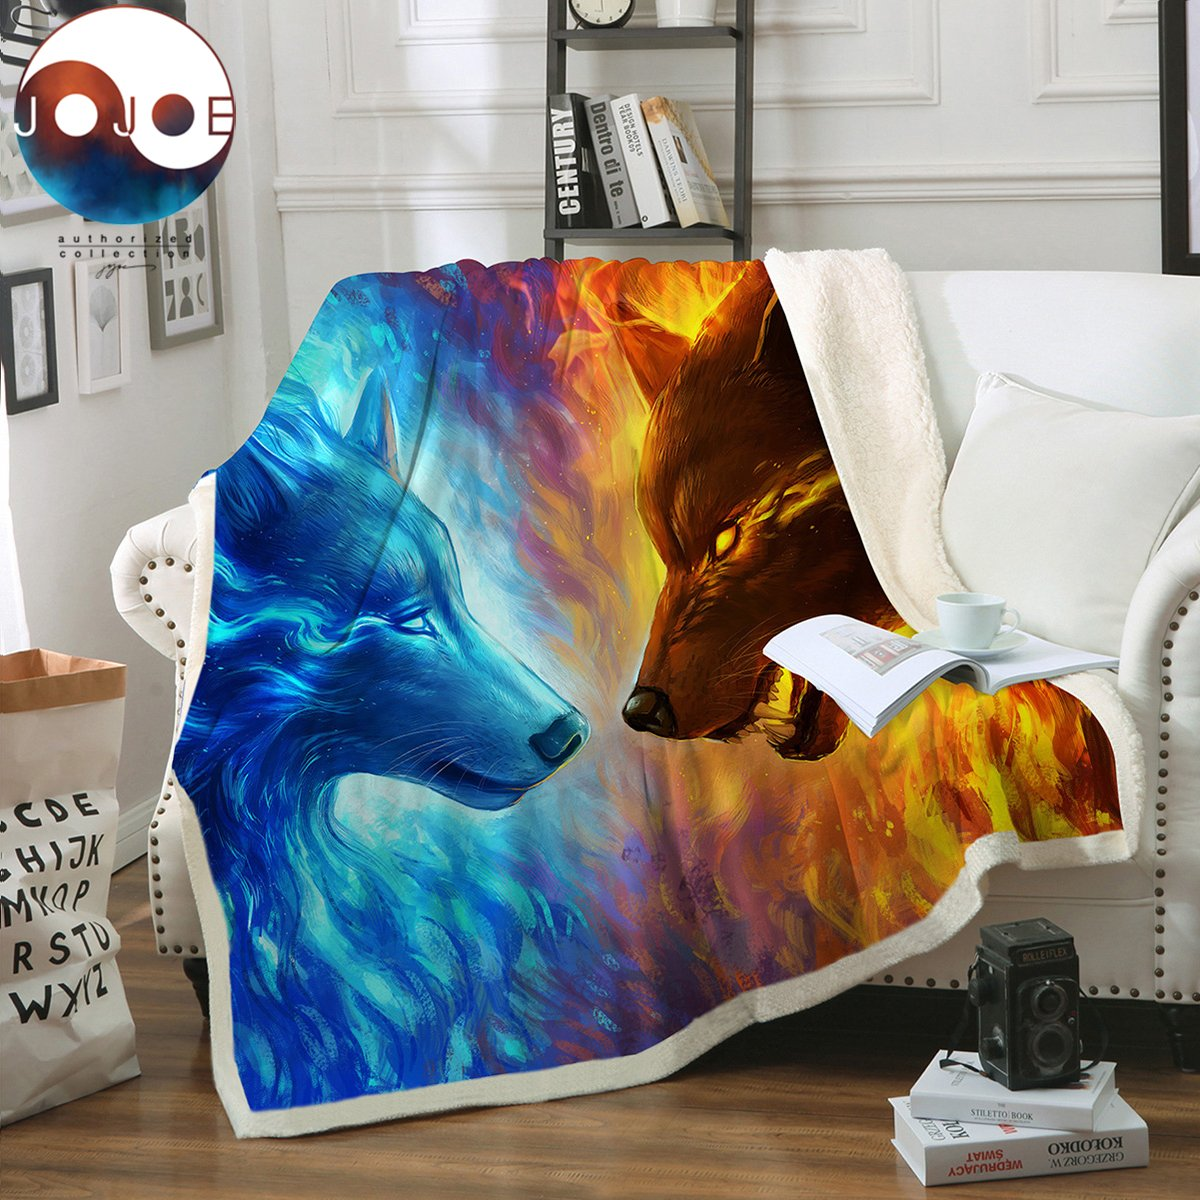 Sleepwish Fire and Ice by JoJoesArt Wolf Sherpa Blanket Blue Orange Animal Print Plush Blanket Thick Machine Washable 60''x80'' by Sleepwish (Image #1)